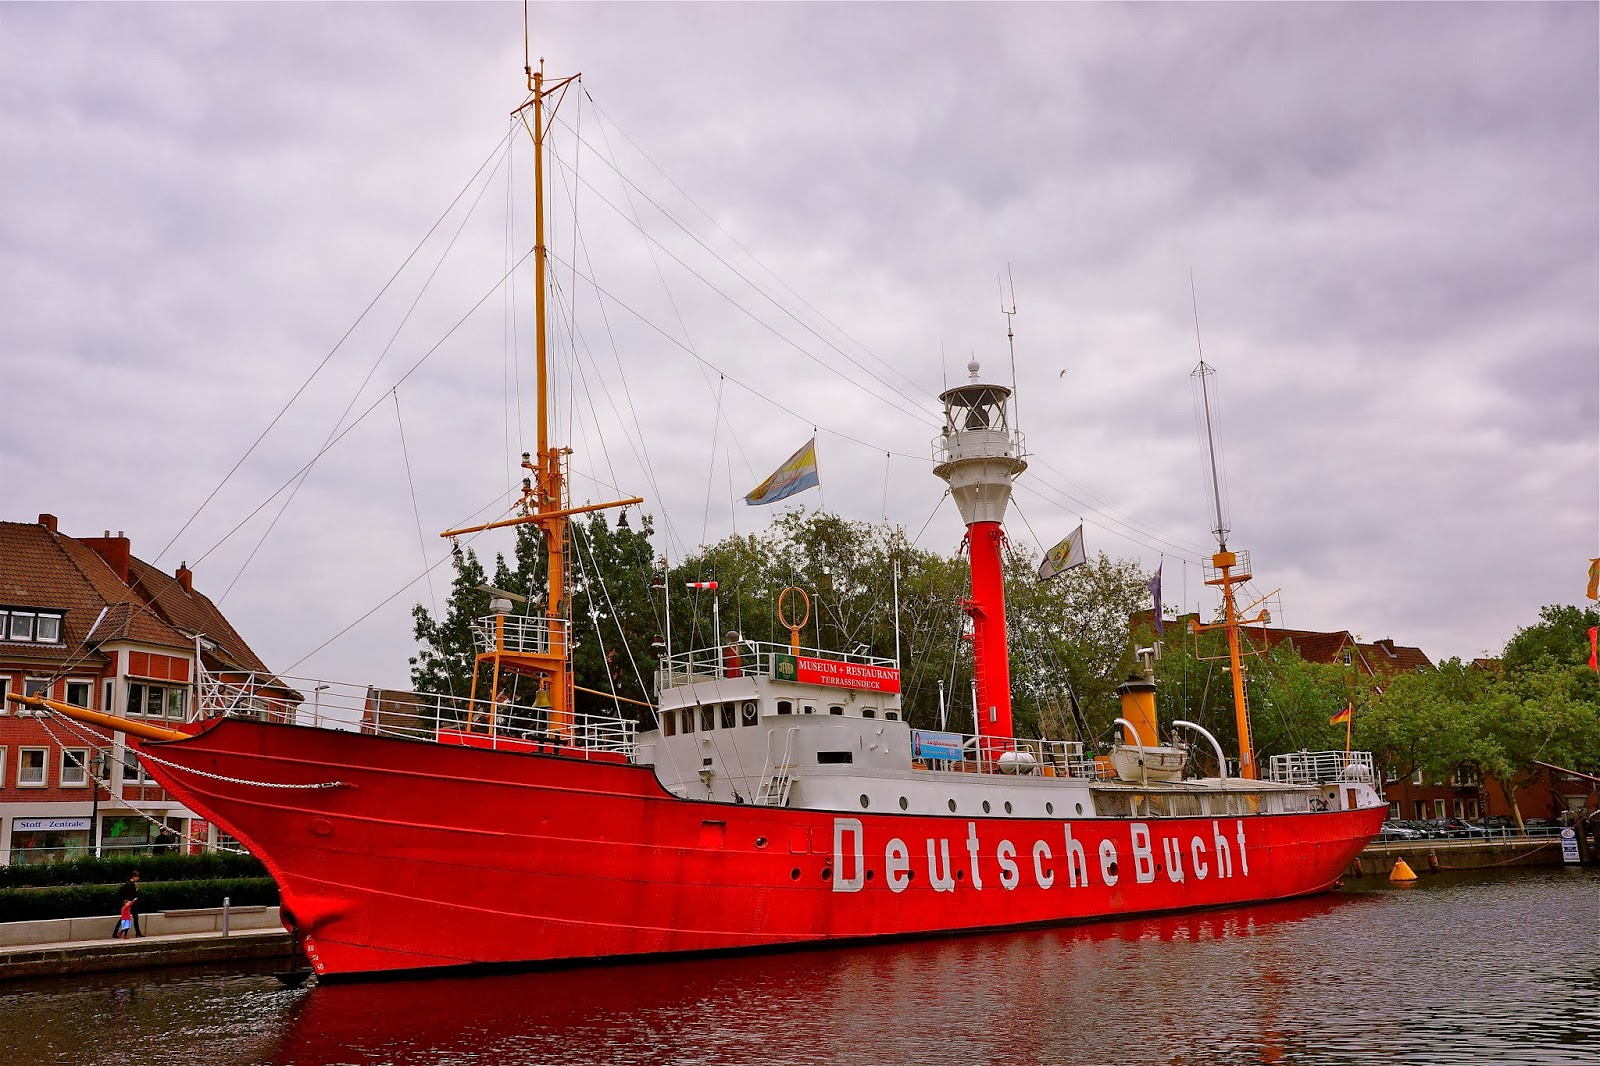 Picture of Deutsche Bucht in Emden, Germany.